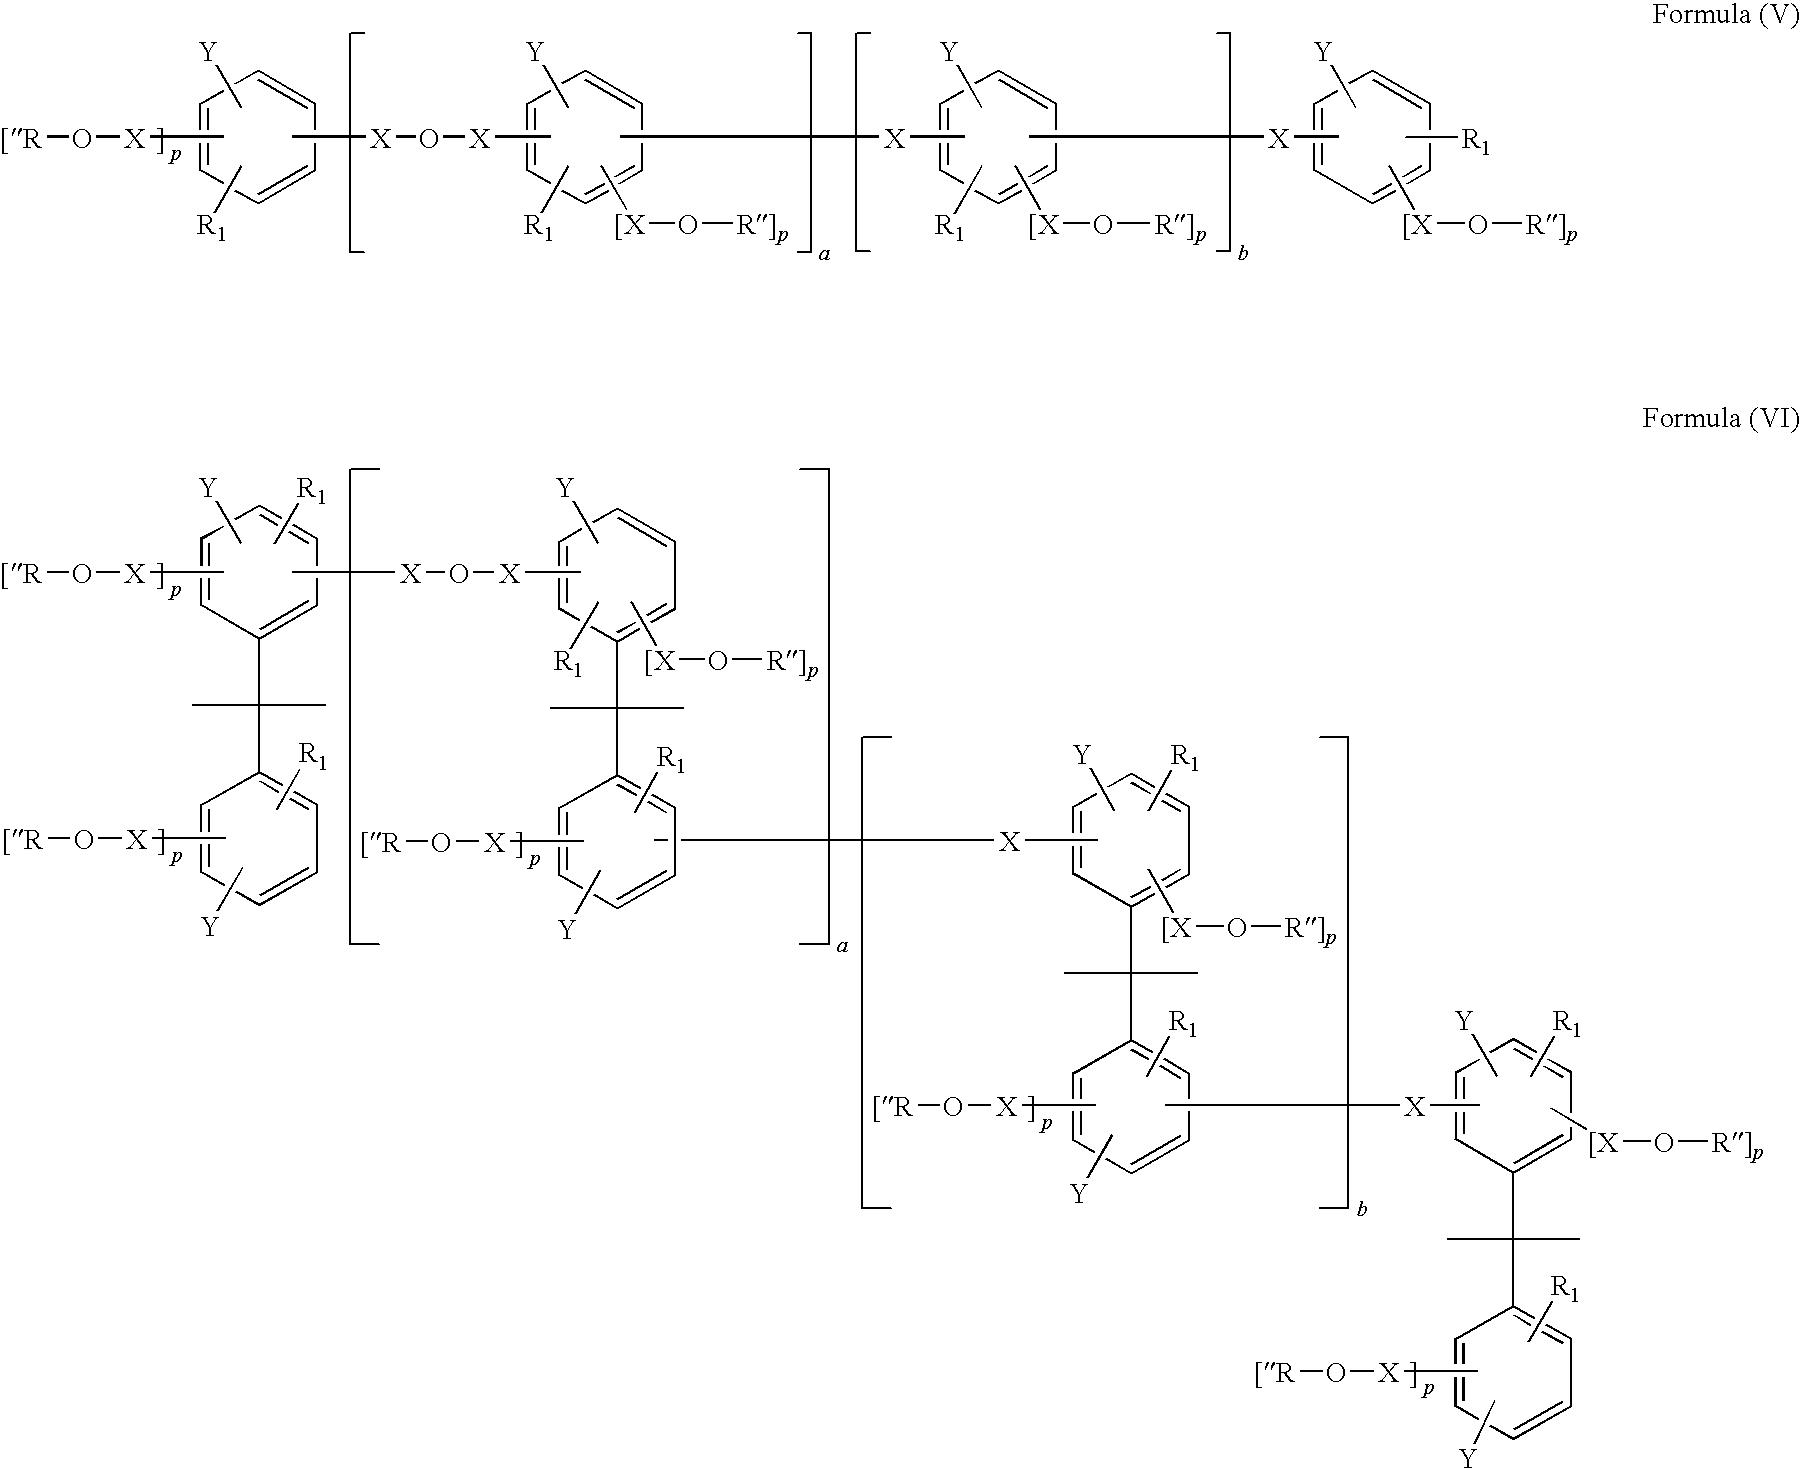 bisphenol f 0158